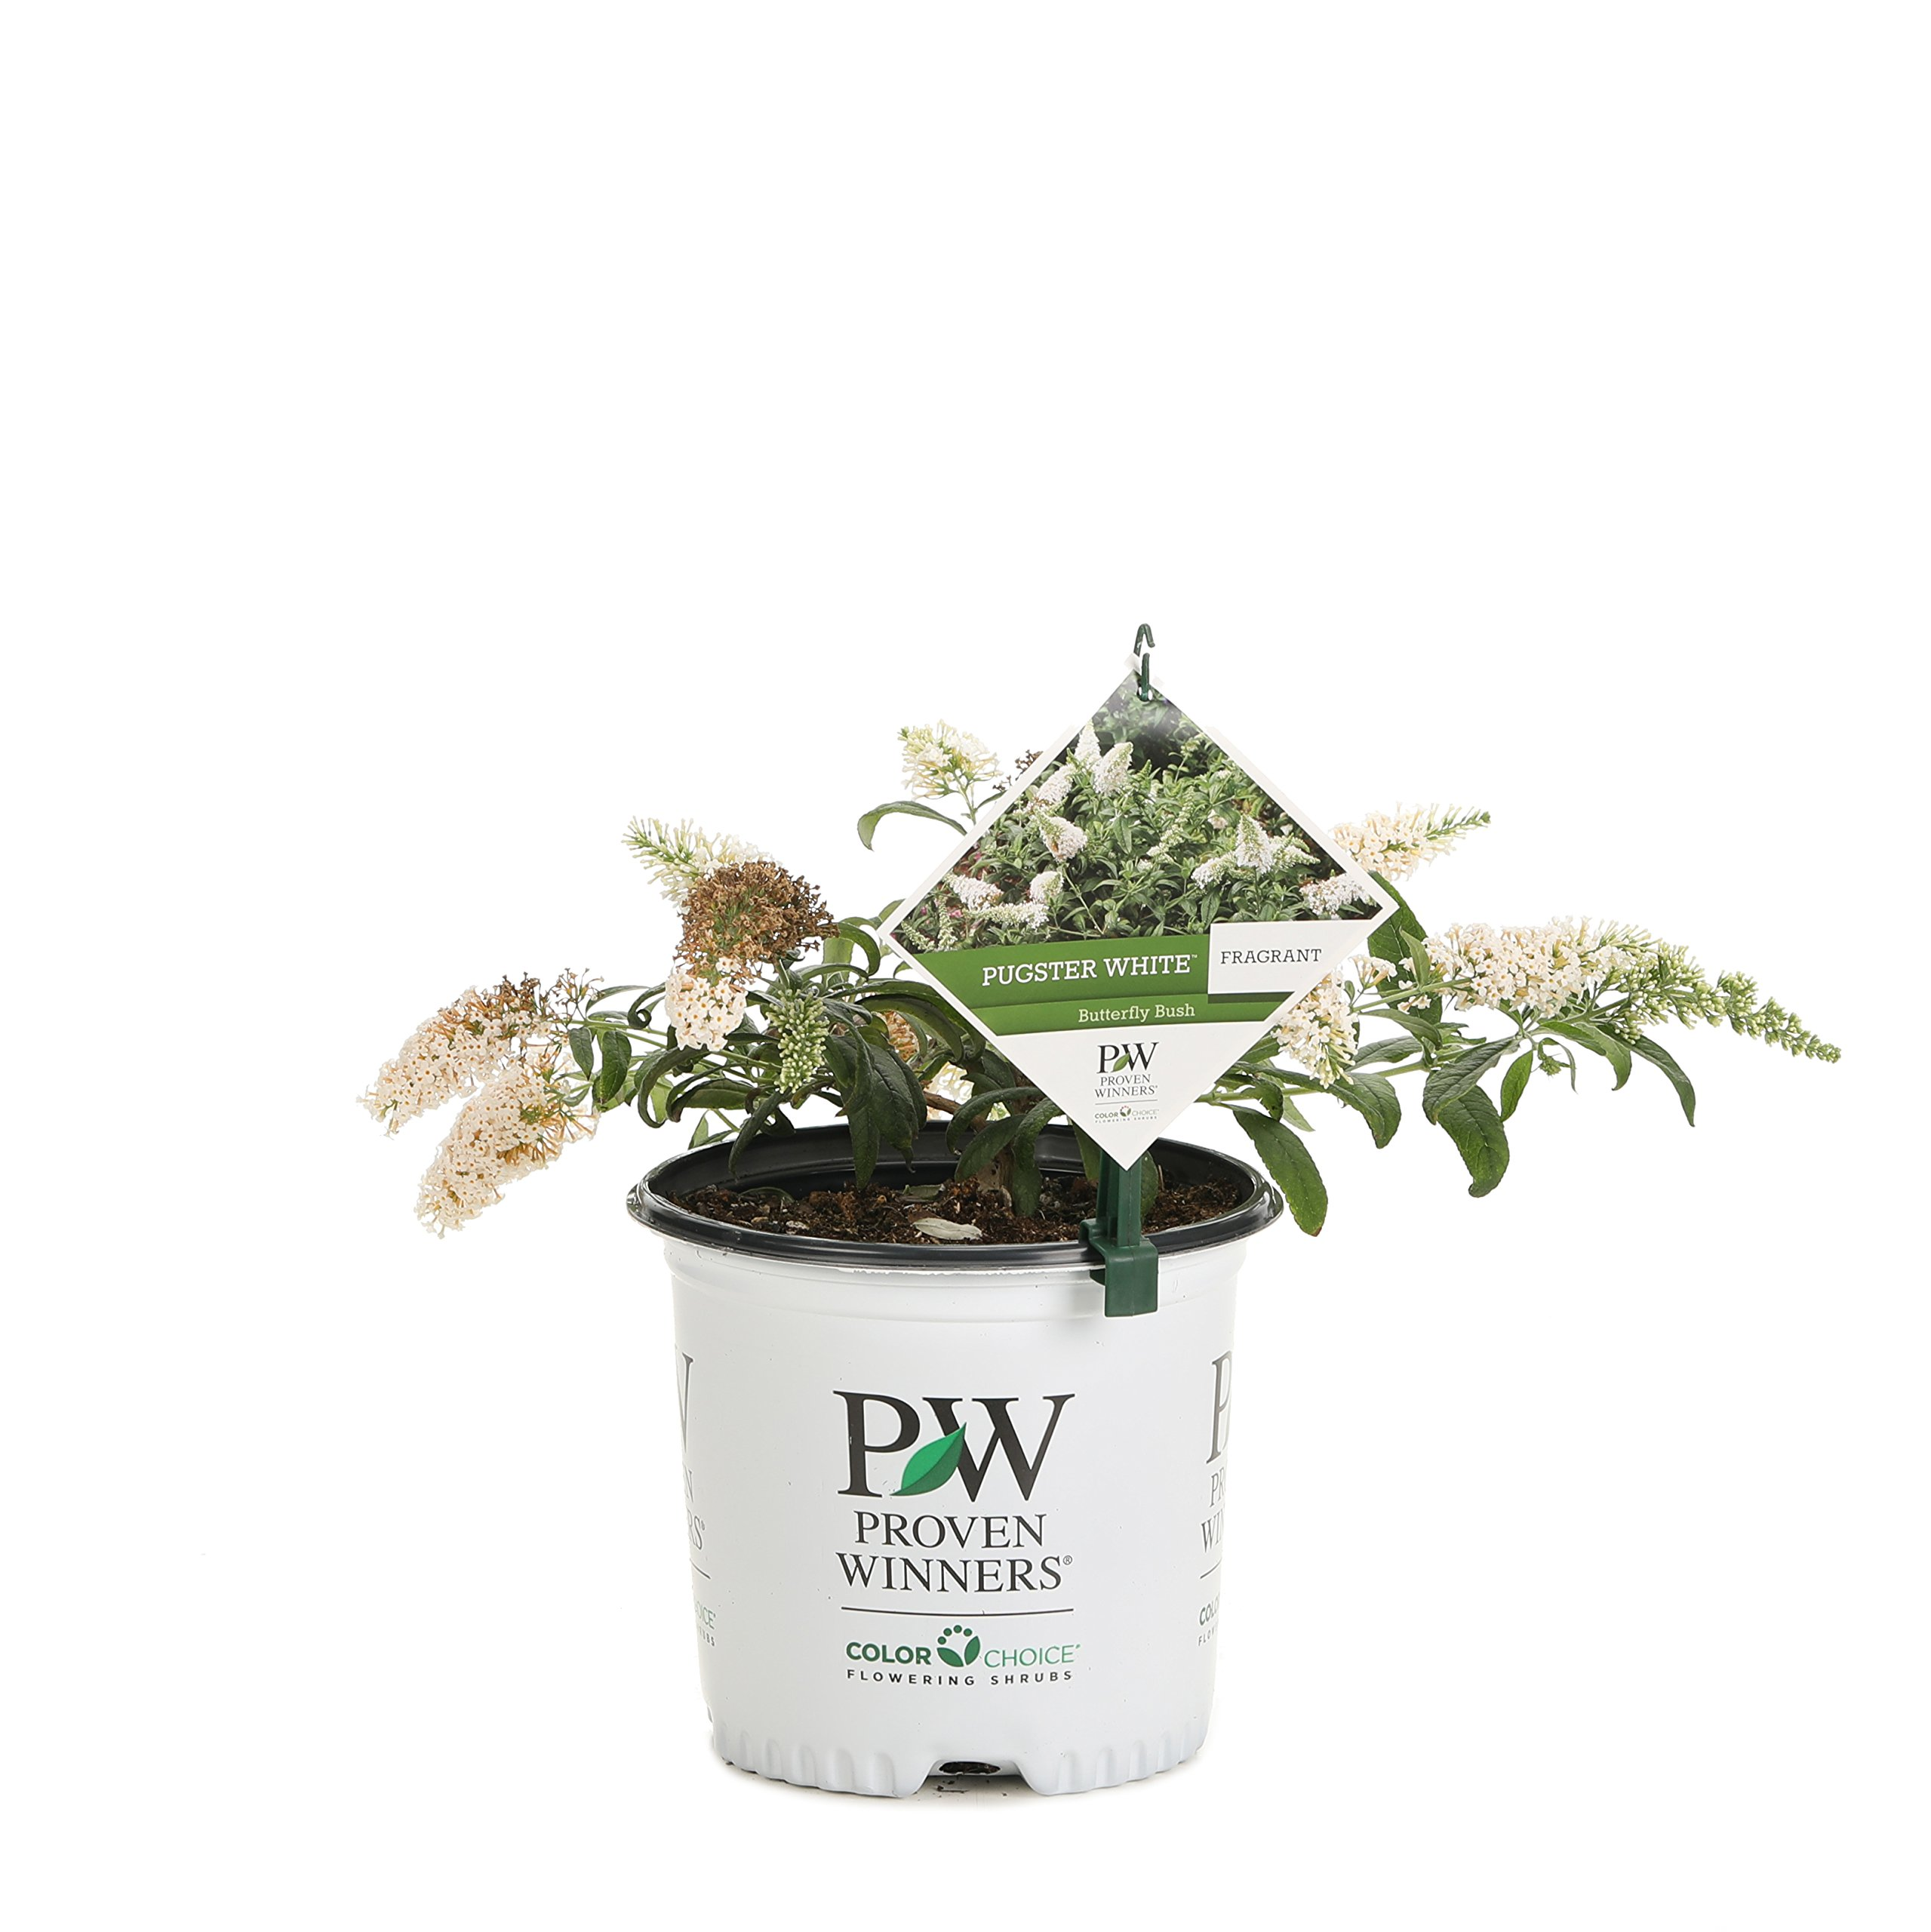 Pugster White Butterfly Bush (Buddleia) Live Shrub, White Flowers, 1 Gallon